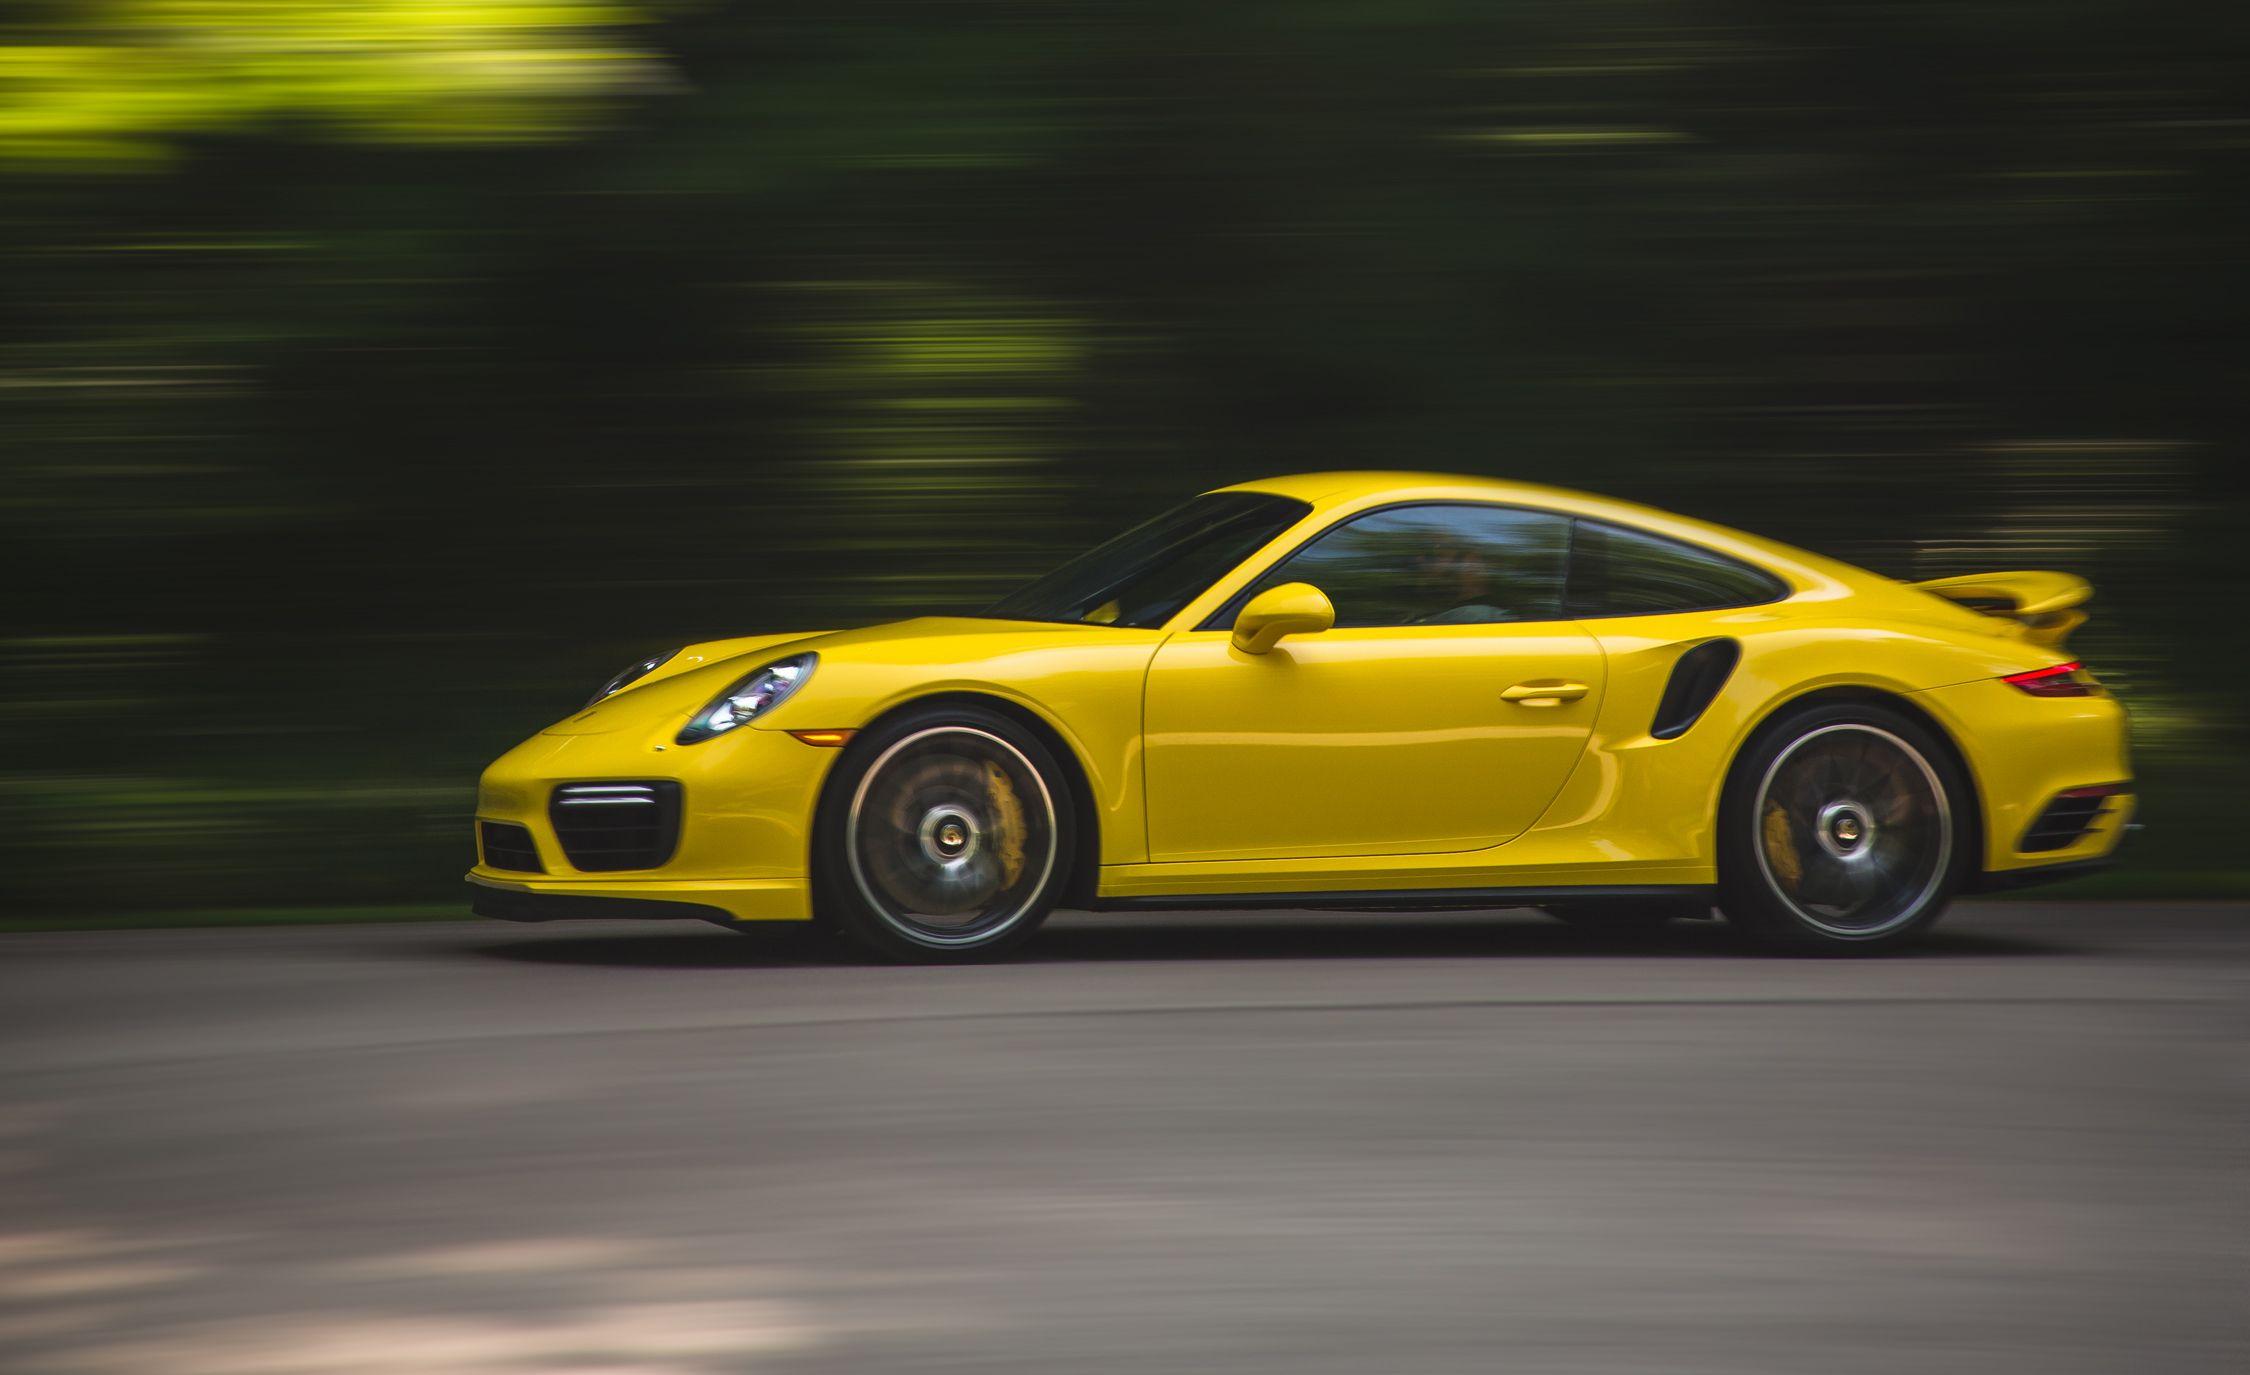 New Porsche Vehicles